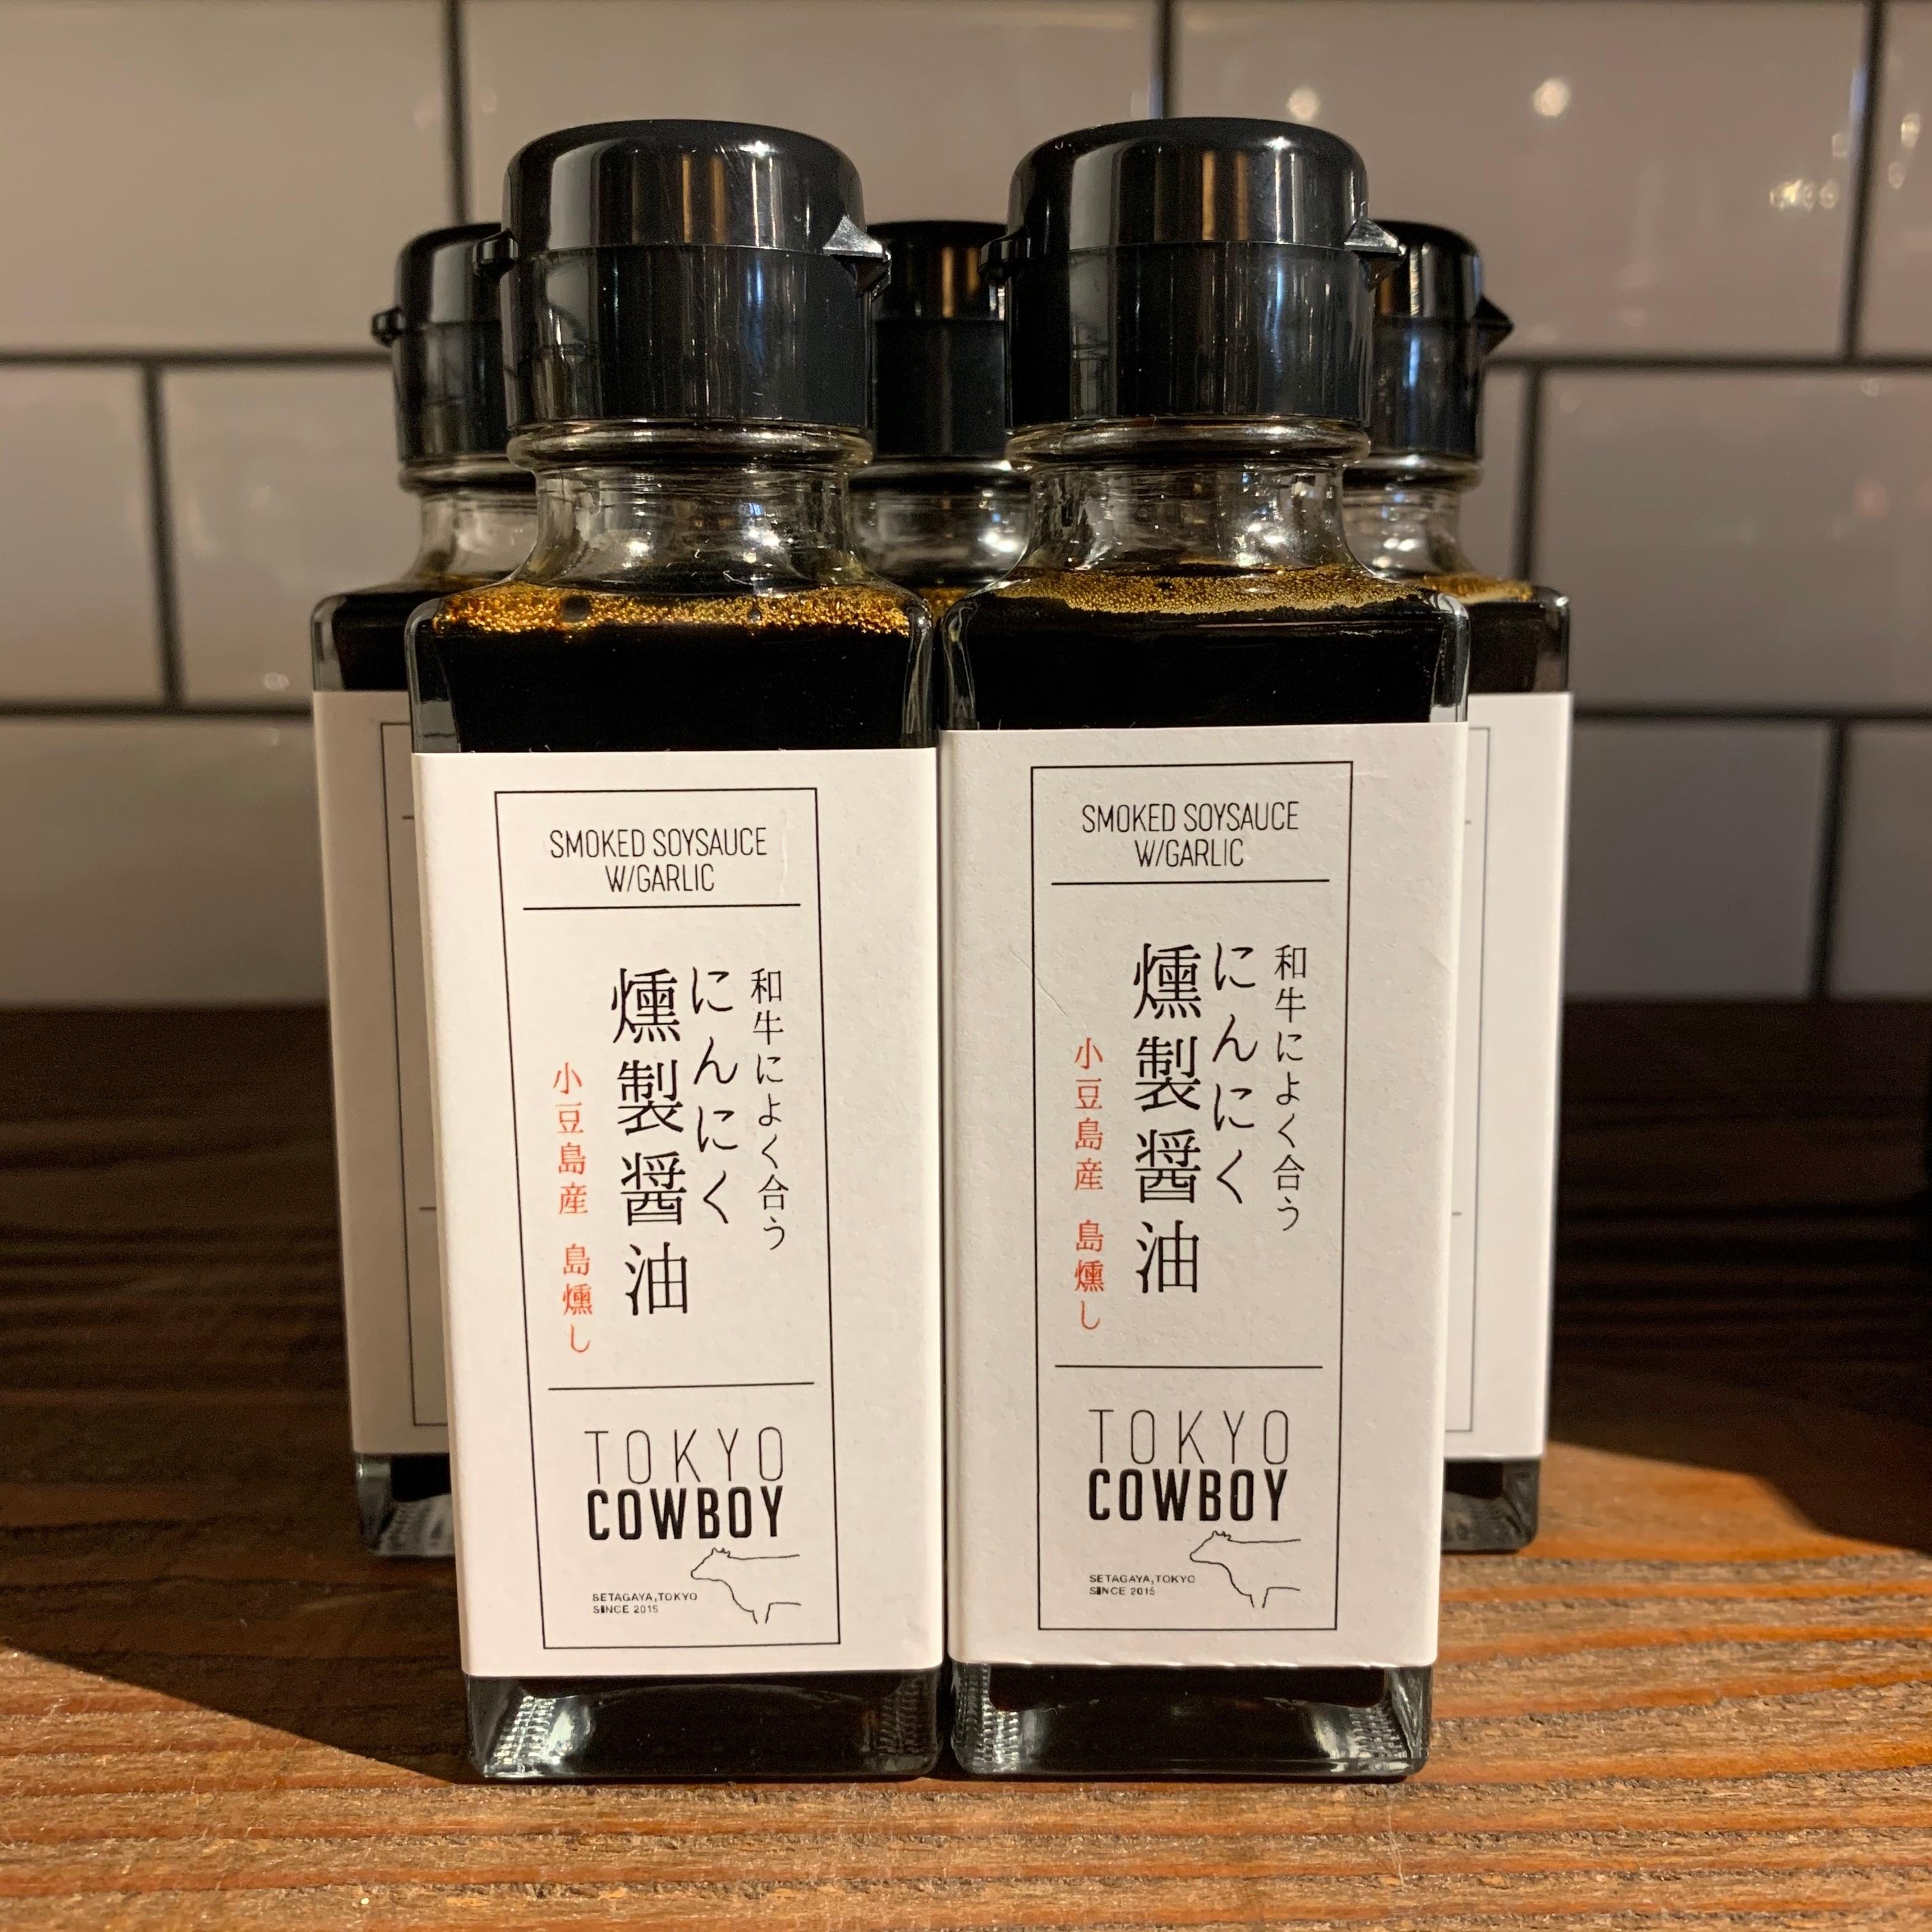 TOKYO COWBOYオリジナル 和牛に合うにんにく燻製醤油(100ml)